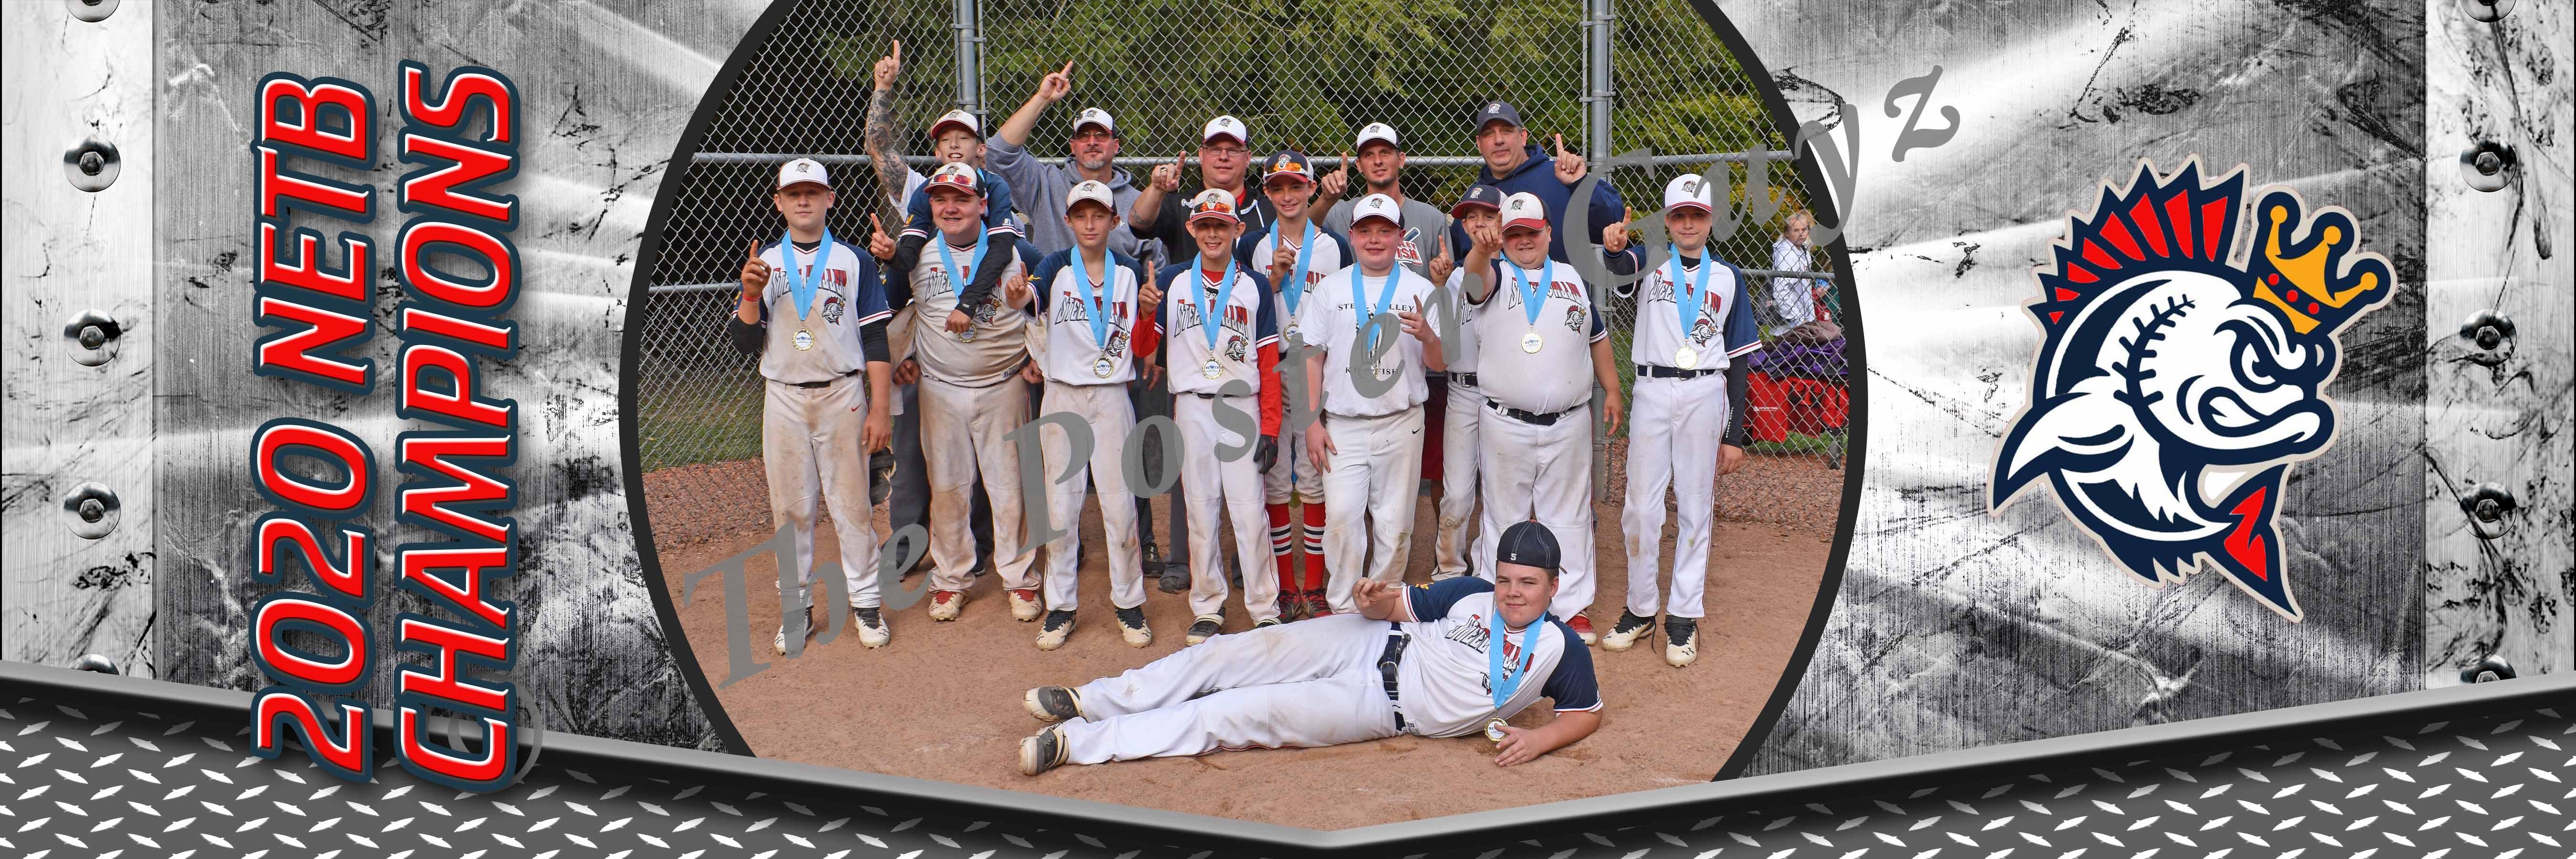 Steel Valley Kingfish 12U - Champions